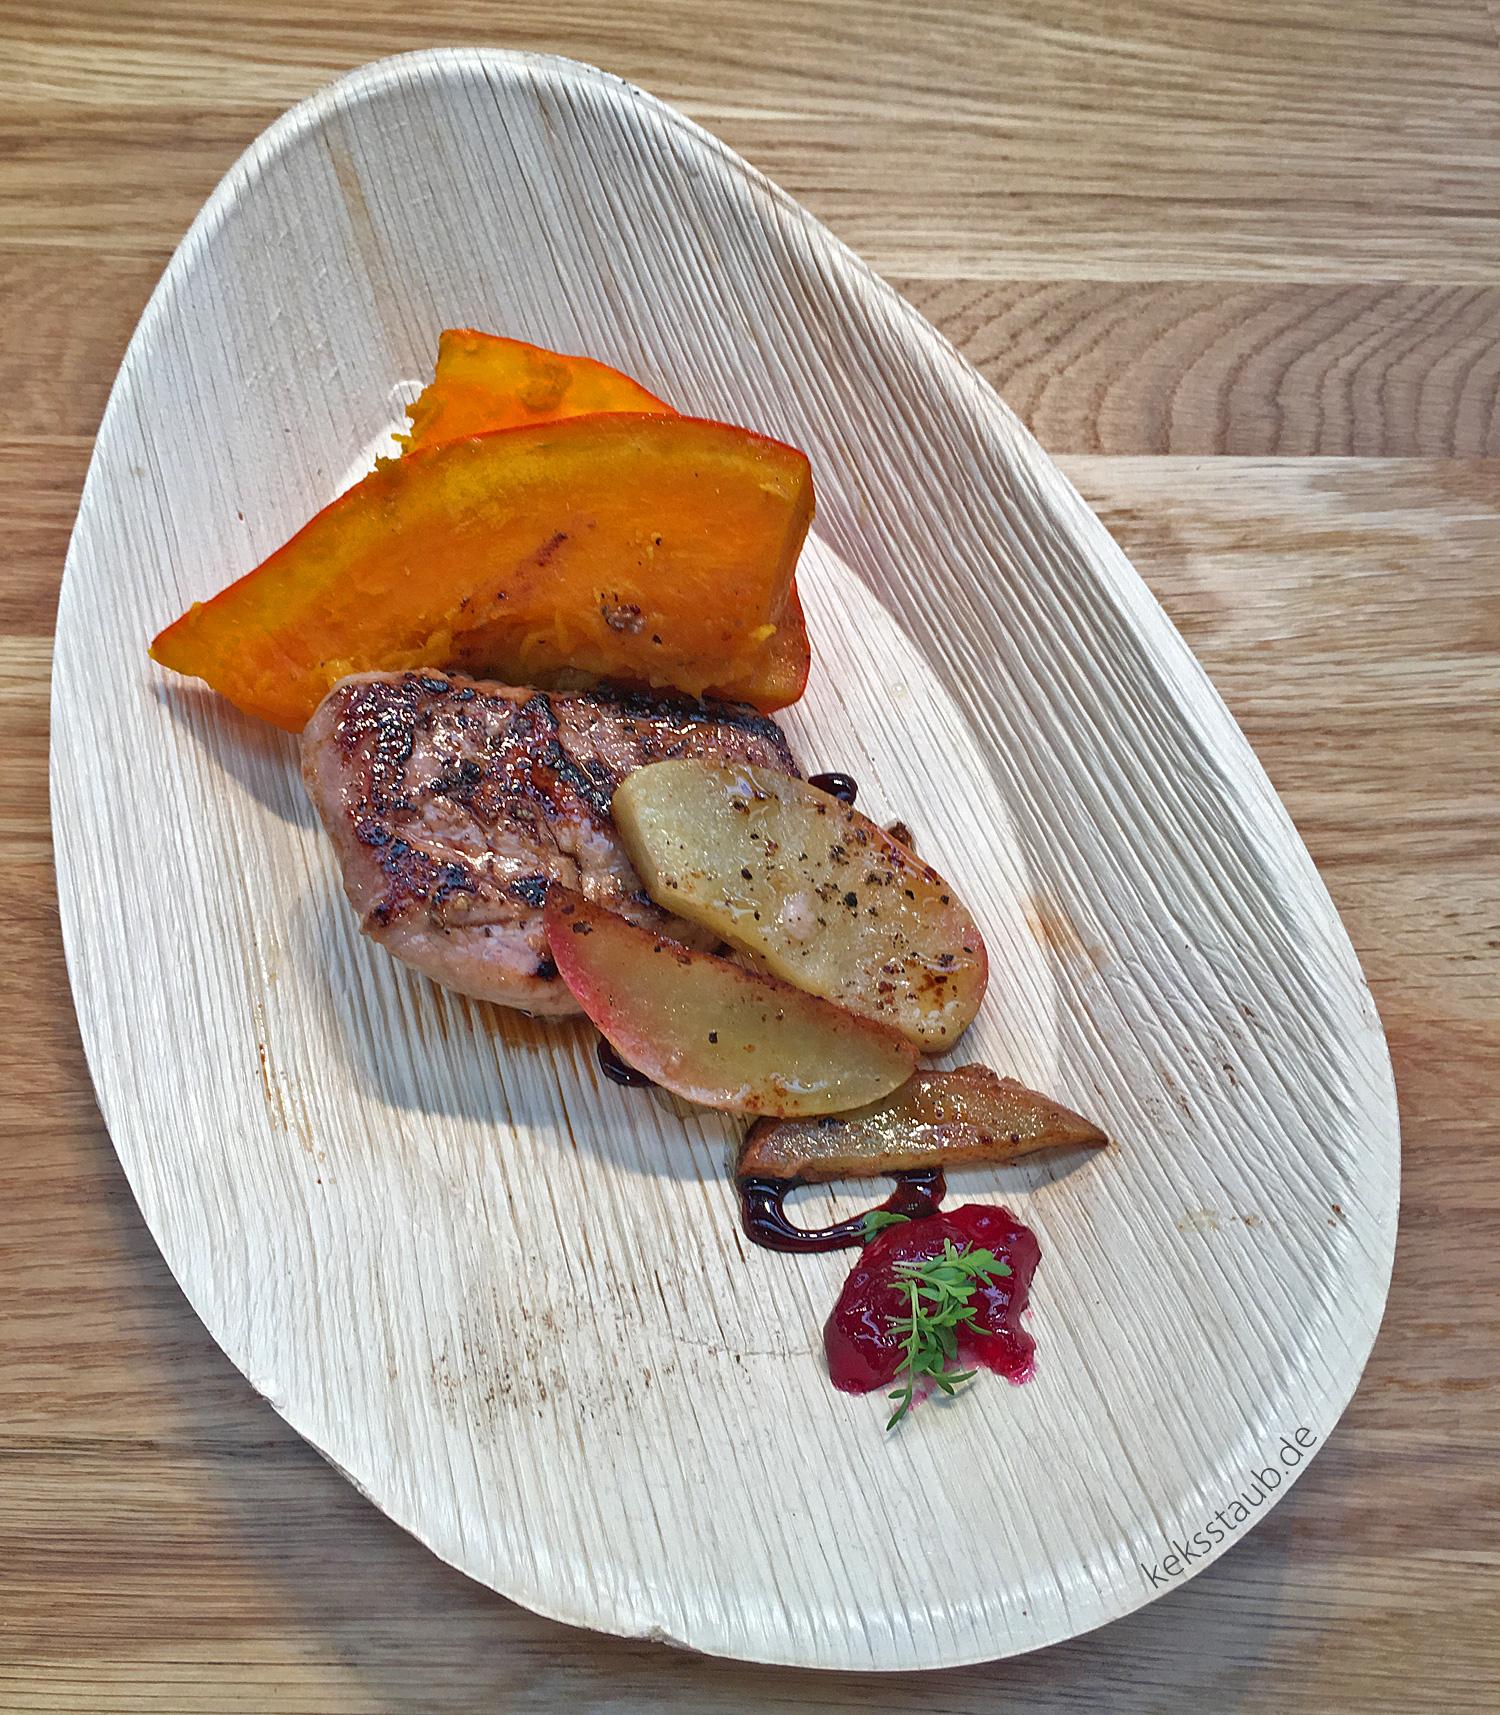 eat-and-style-miele-sous-vide-kochen-schweinefilet-angerichtet